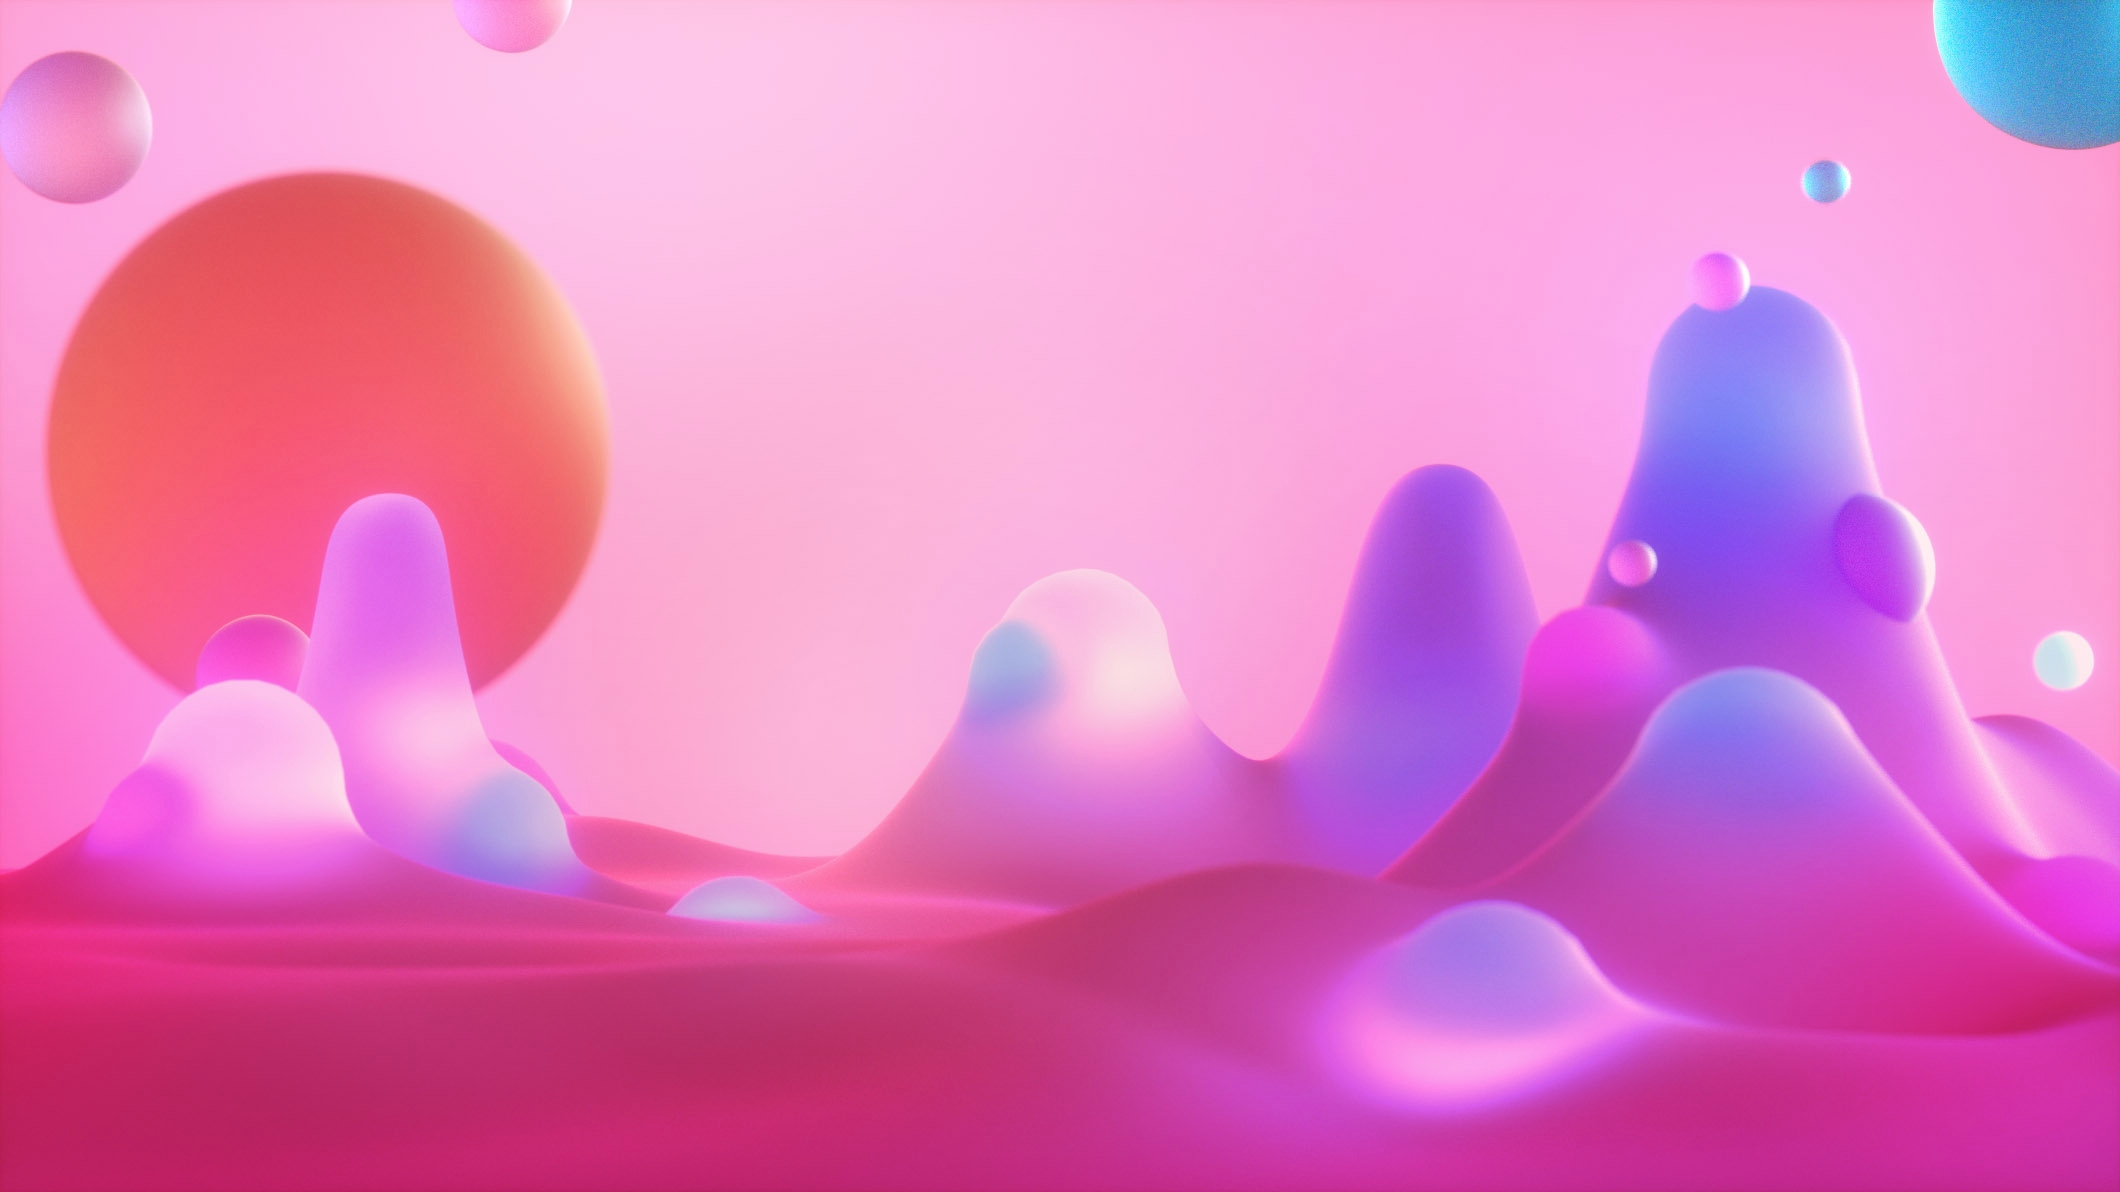 artwork launch Opera Neon - velvetspectrum | ello